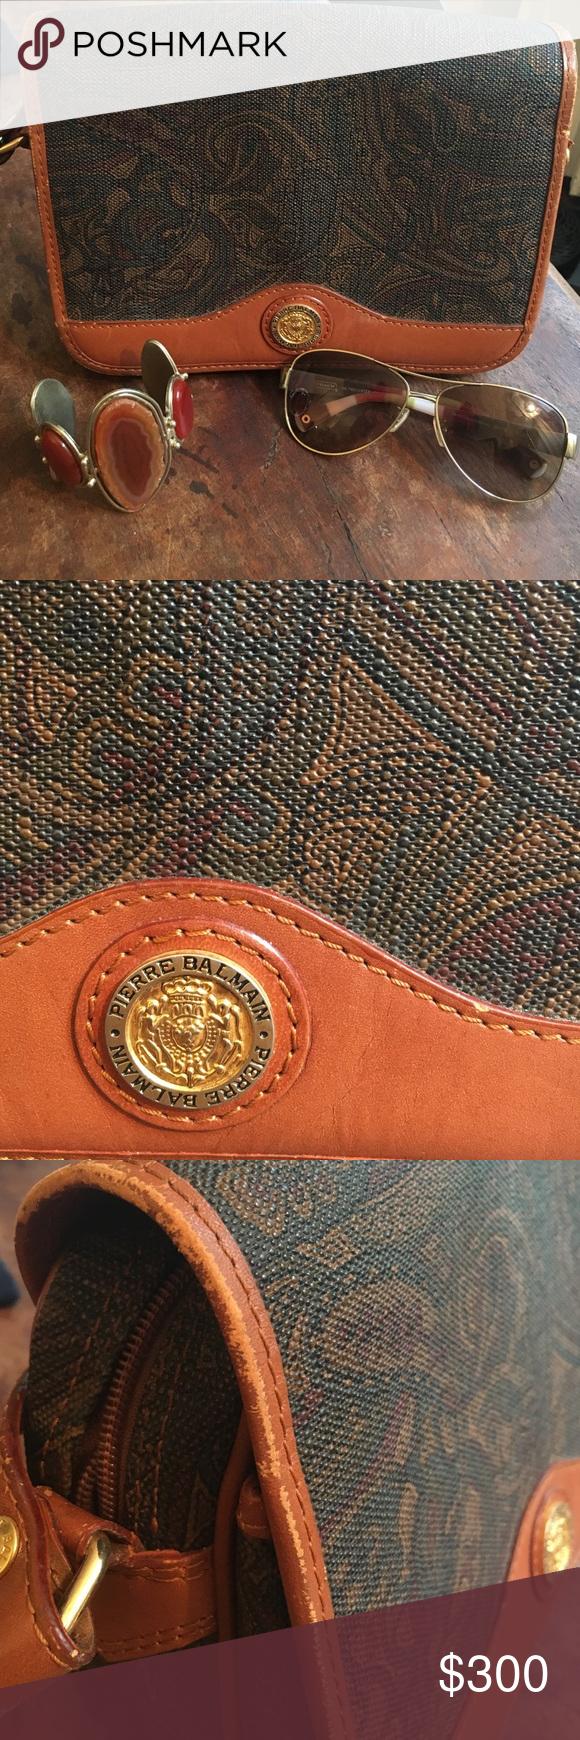 Rare Vintage Pierre Balmain Saddle Bag